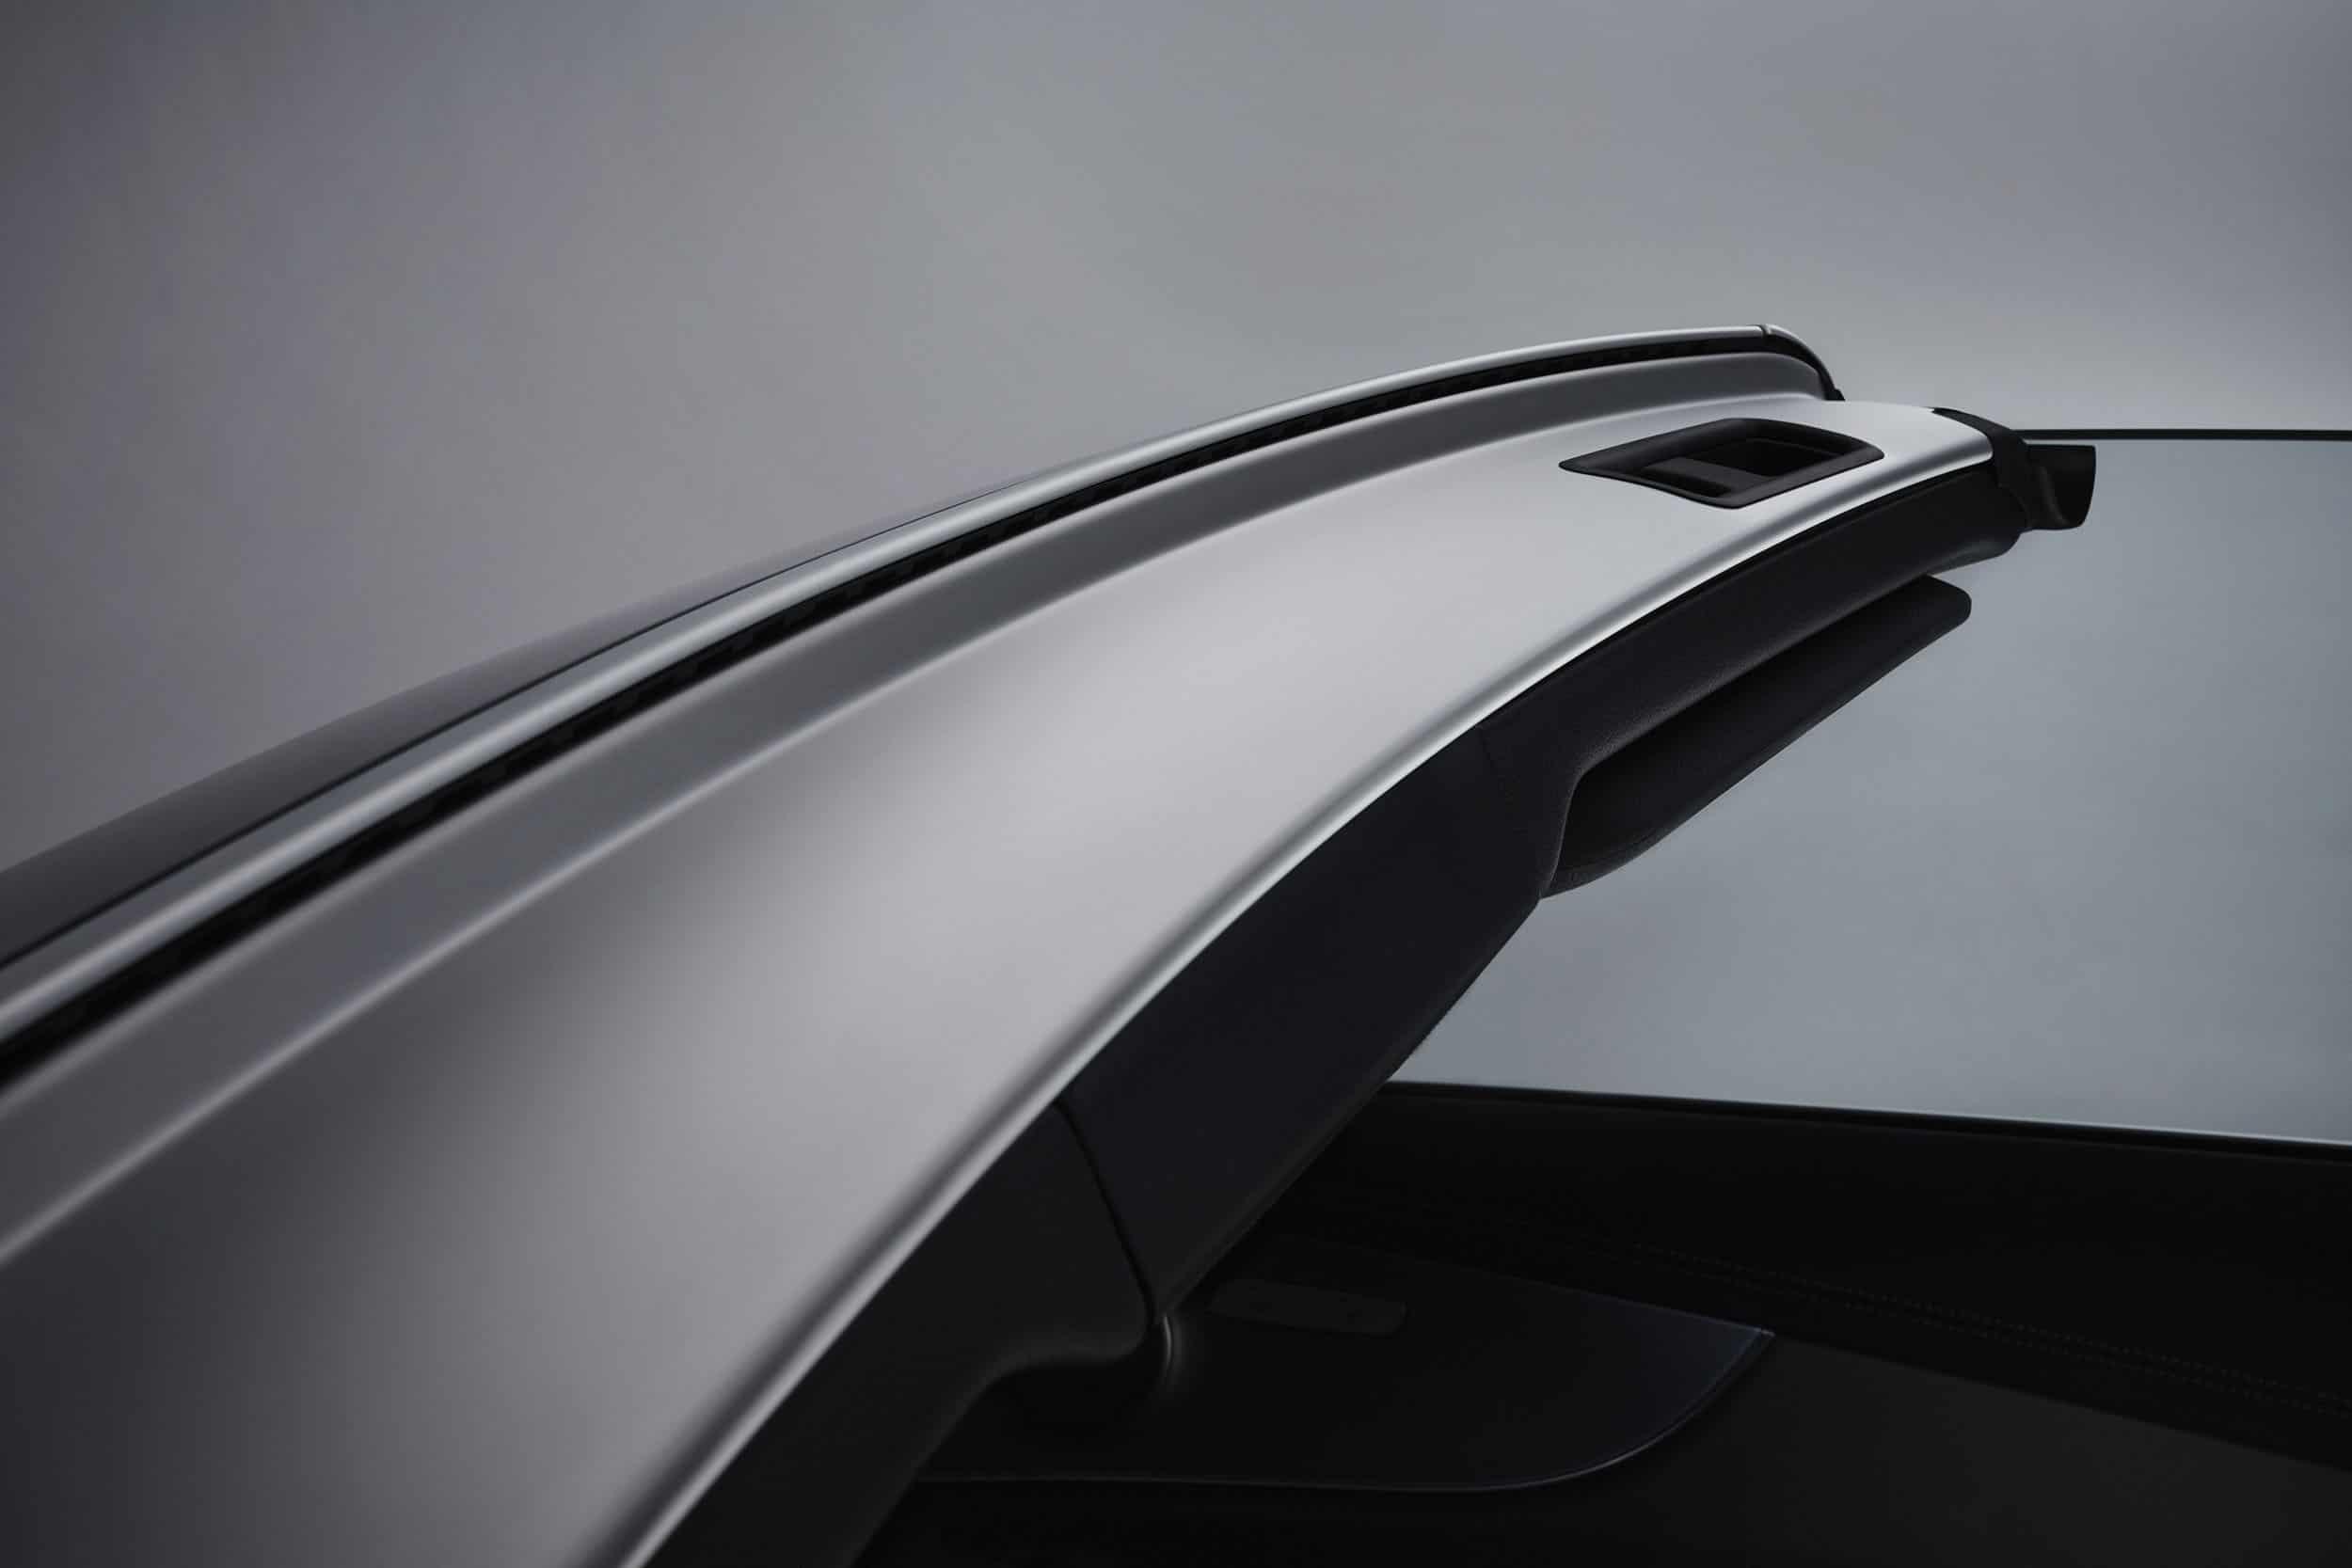 studio-ignatov-wkw-automotive-imagekampagne-bw-07